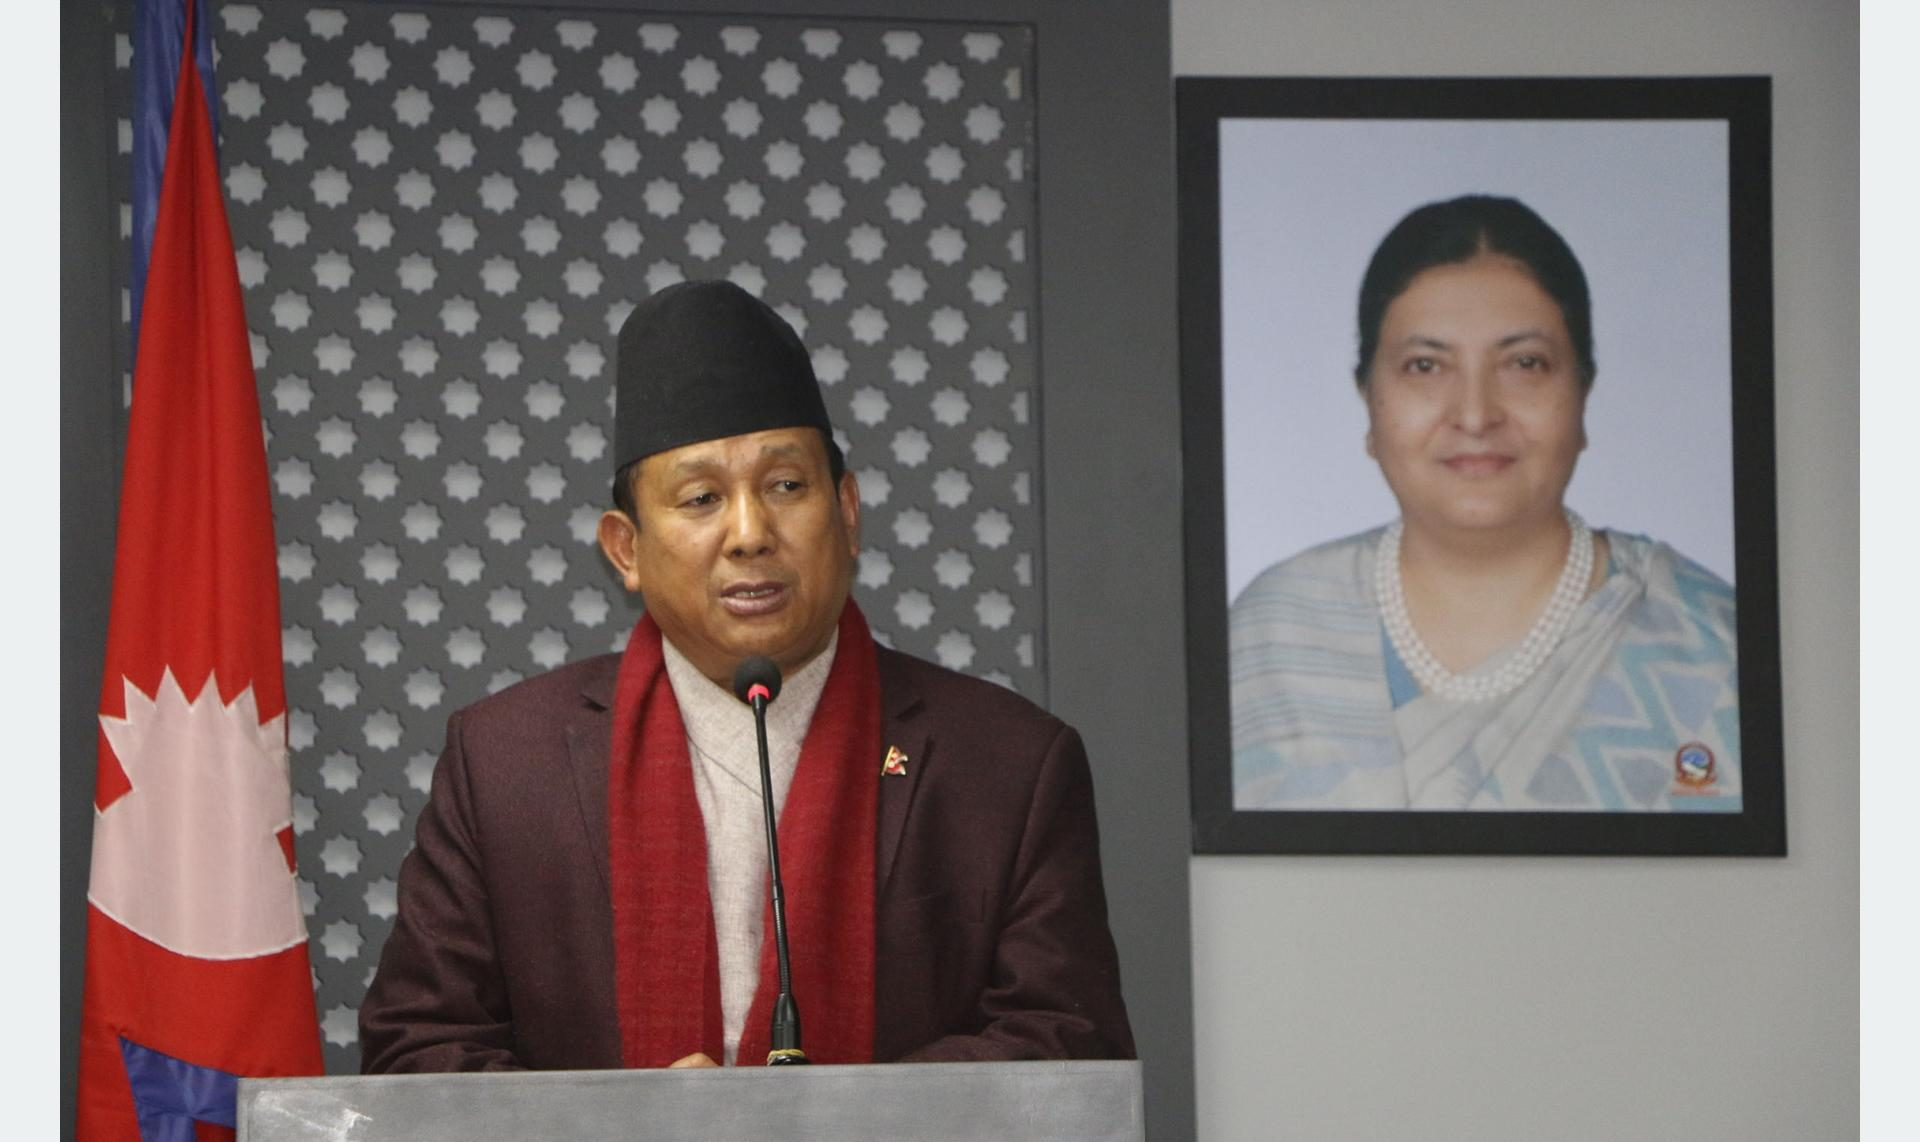 चुनावको घोषणा असंवैधानिक हुन सक्दैन : मन्त्री गुरुङ